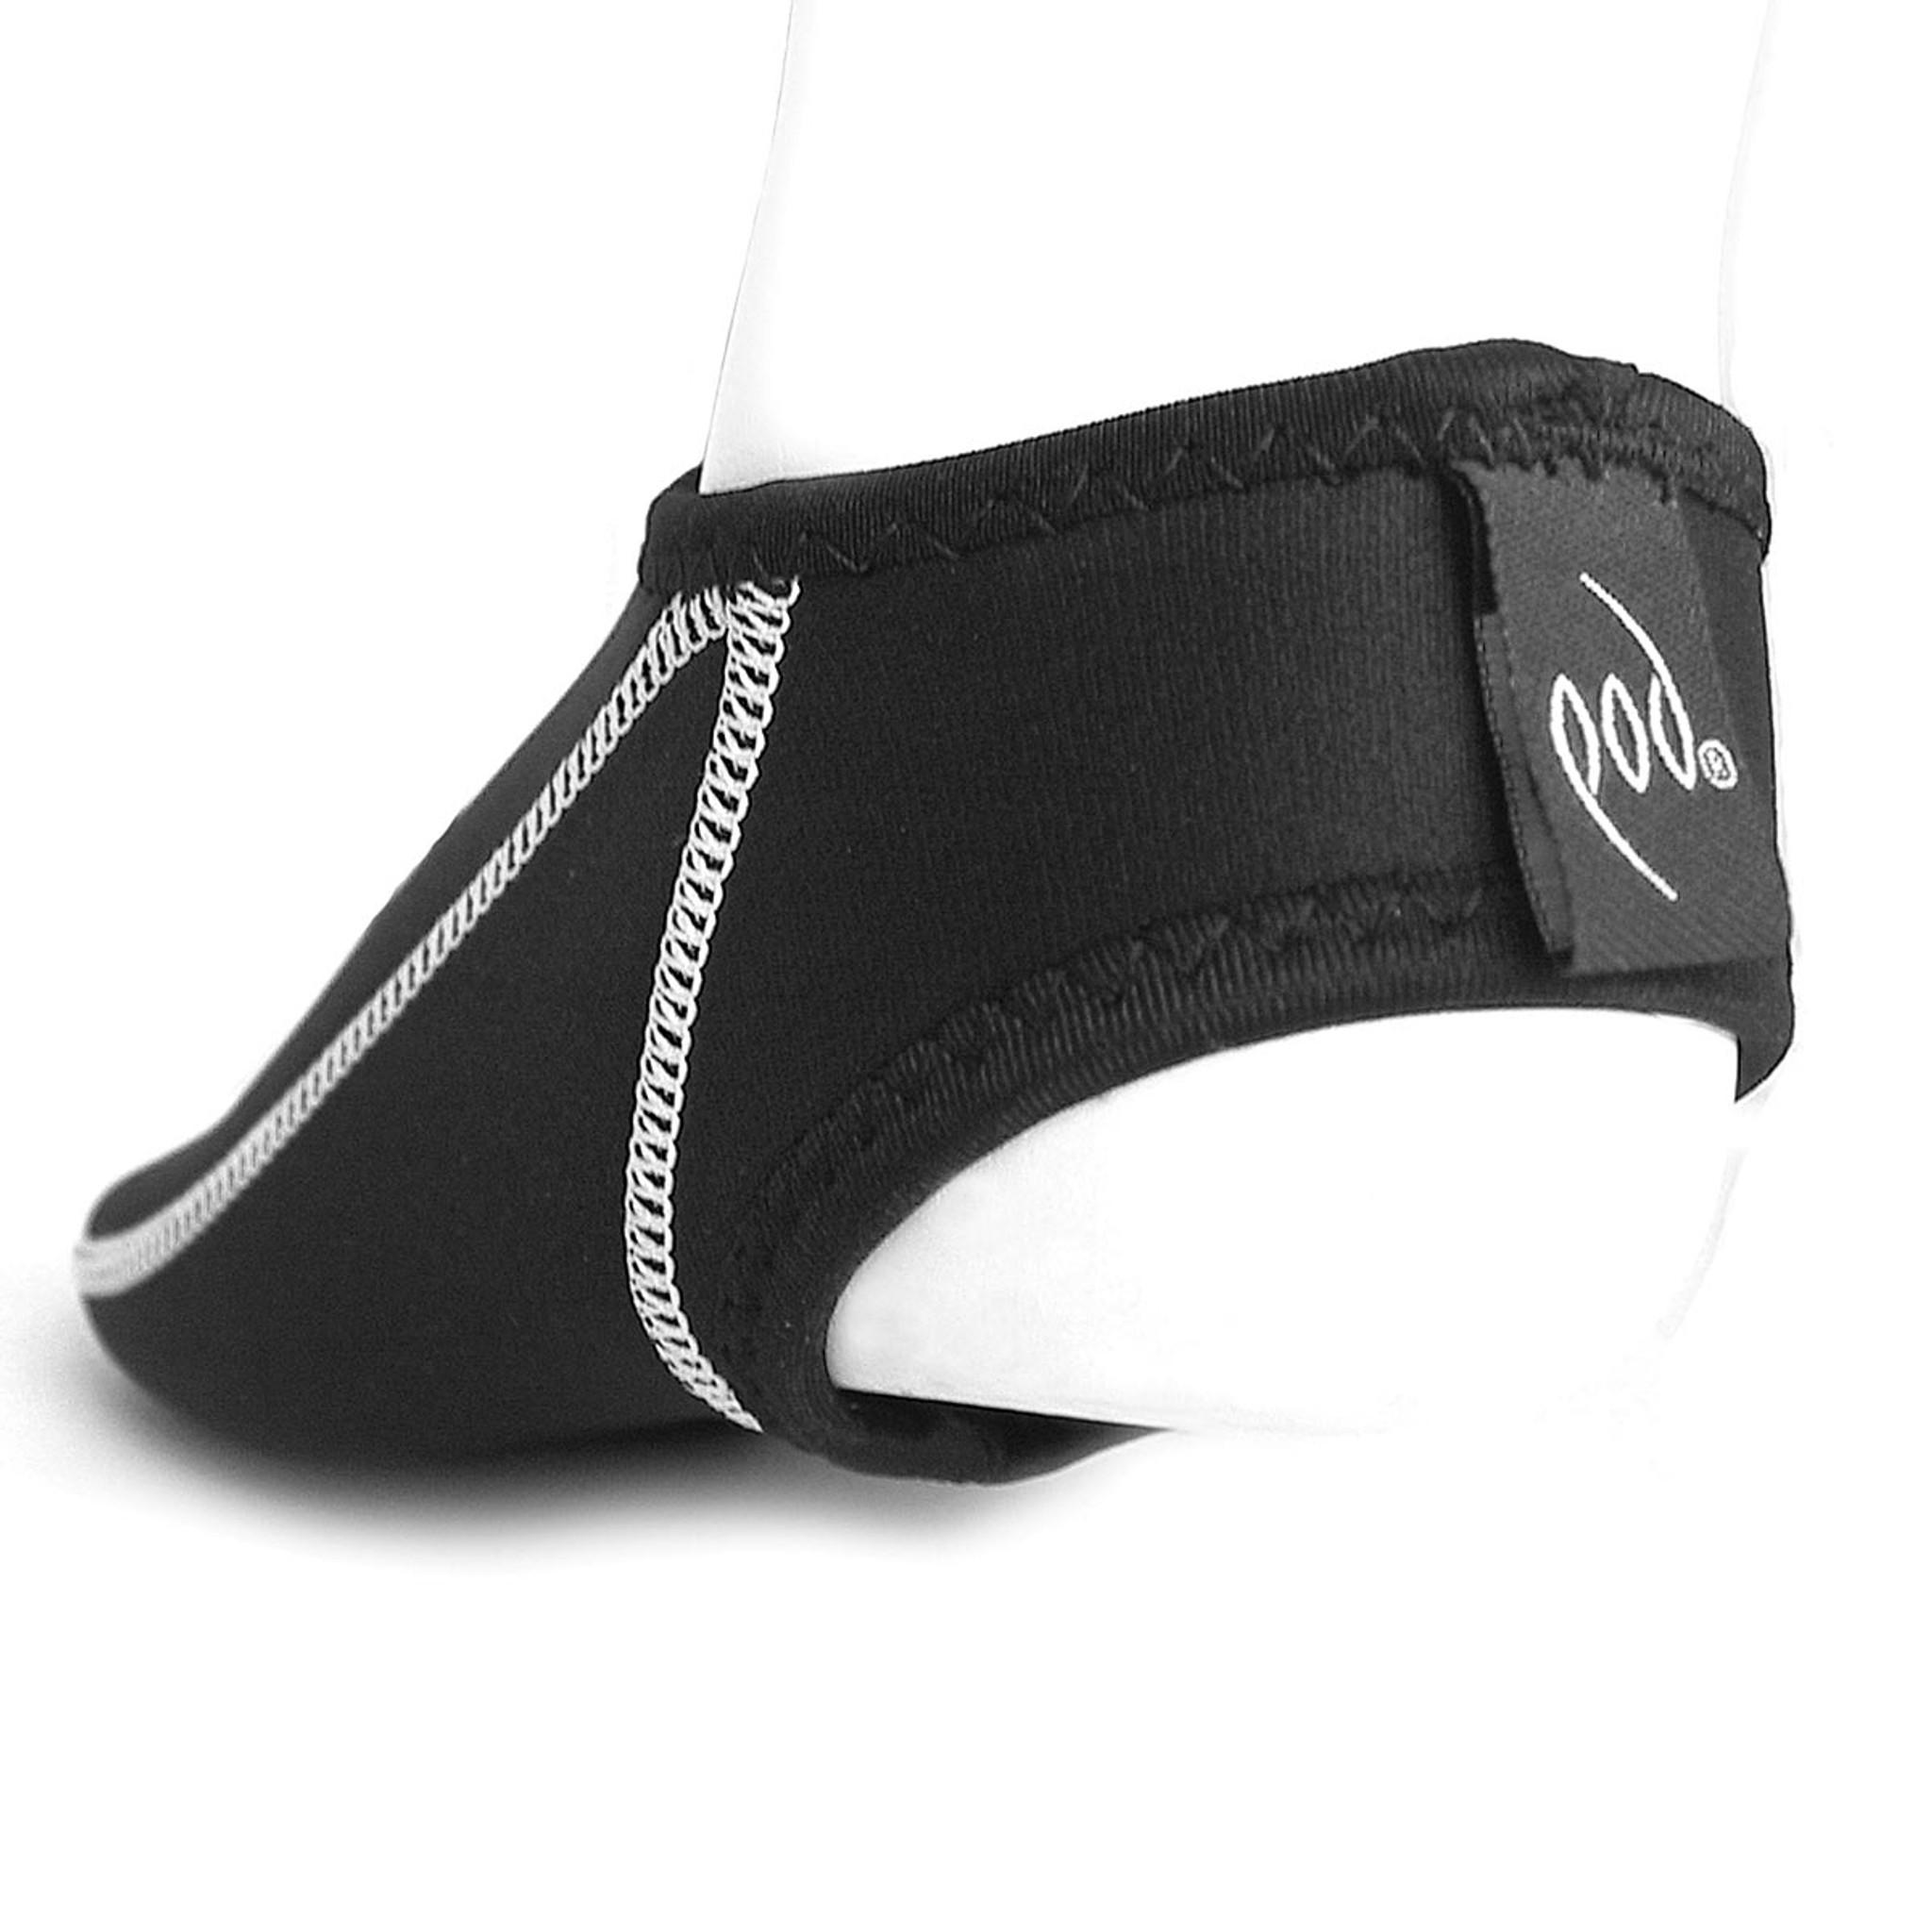 Bodysurfing Tools - POD Fins PF1 Handboard Socks Fins Straps